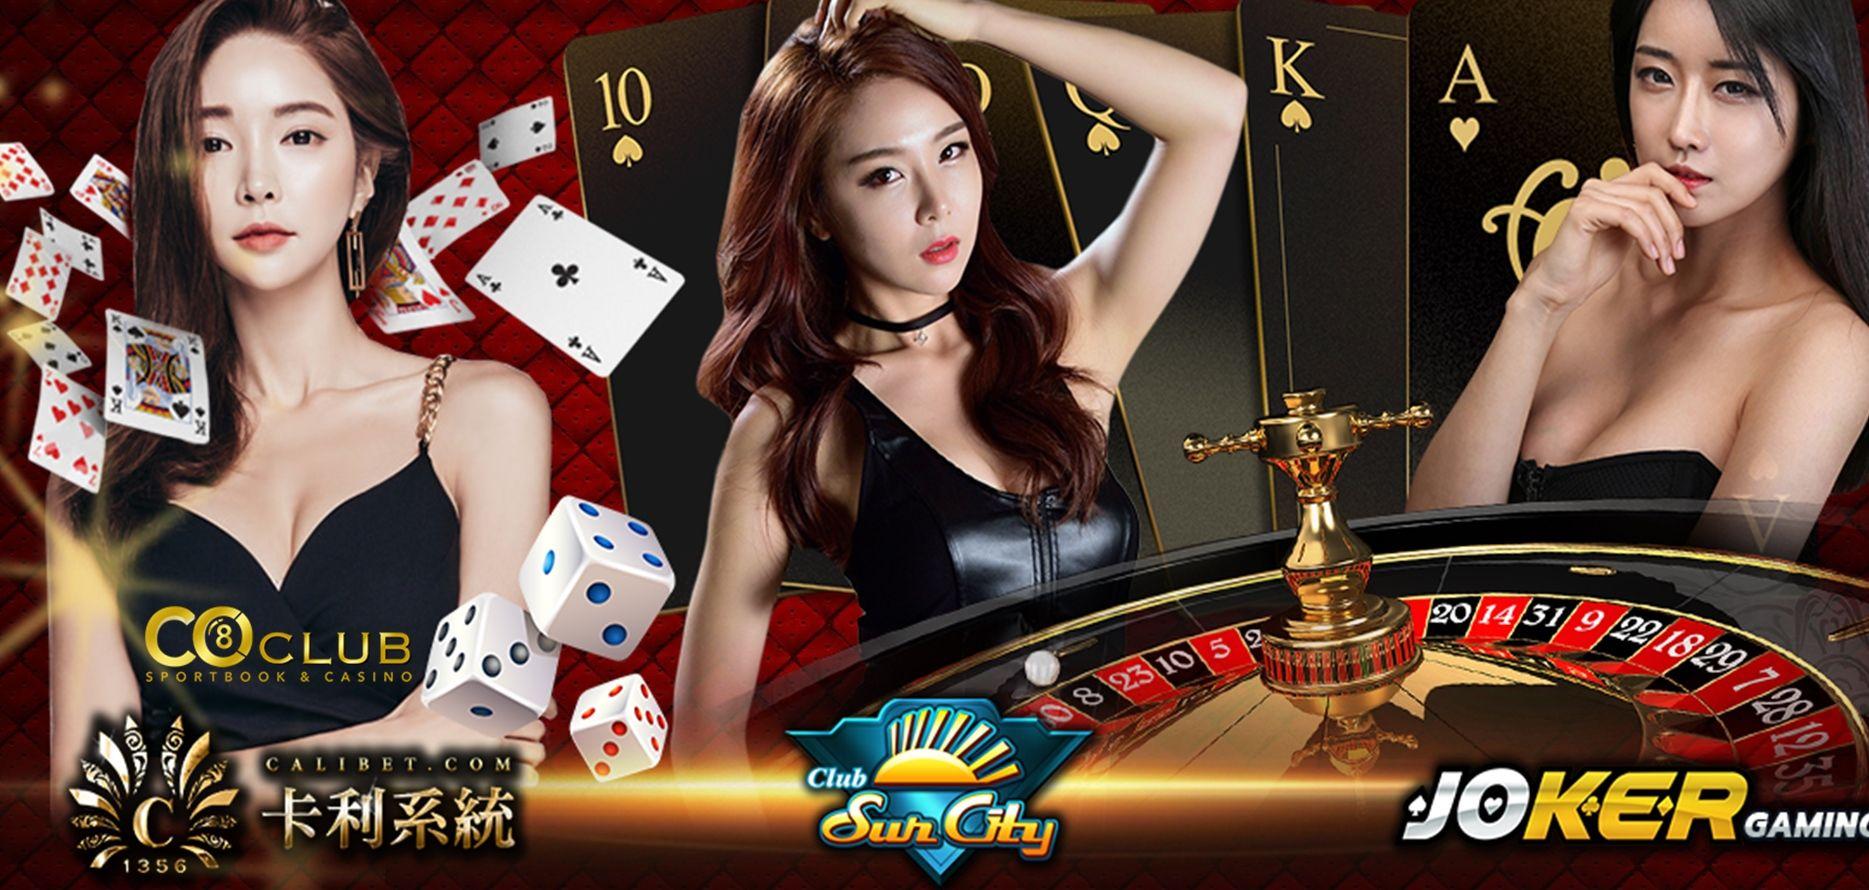 Suncity Joker Slot Game or Table Game Online Casino Malaysia Vietnam #scr888 #suncity #lpe…